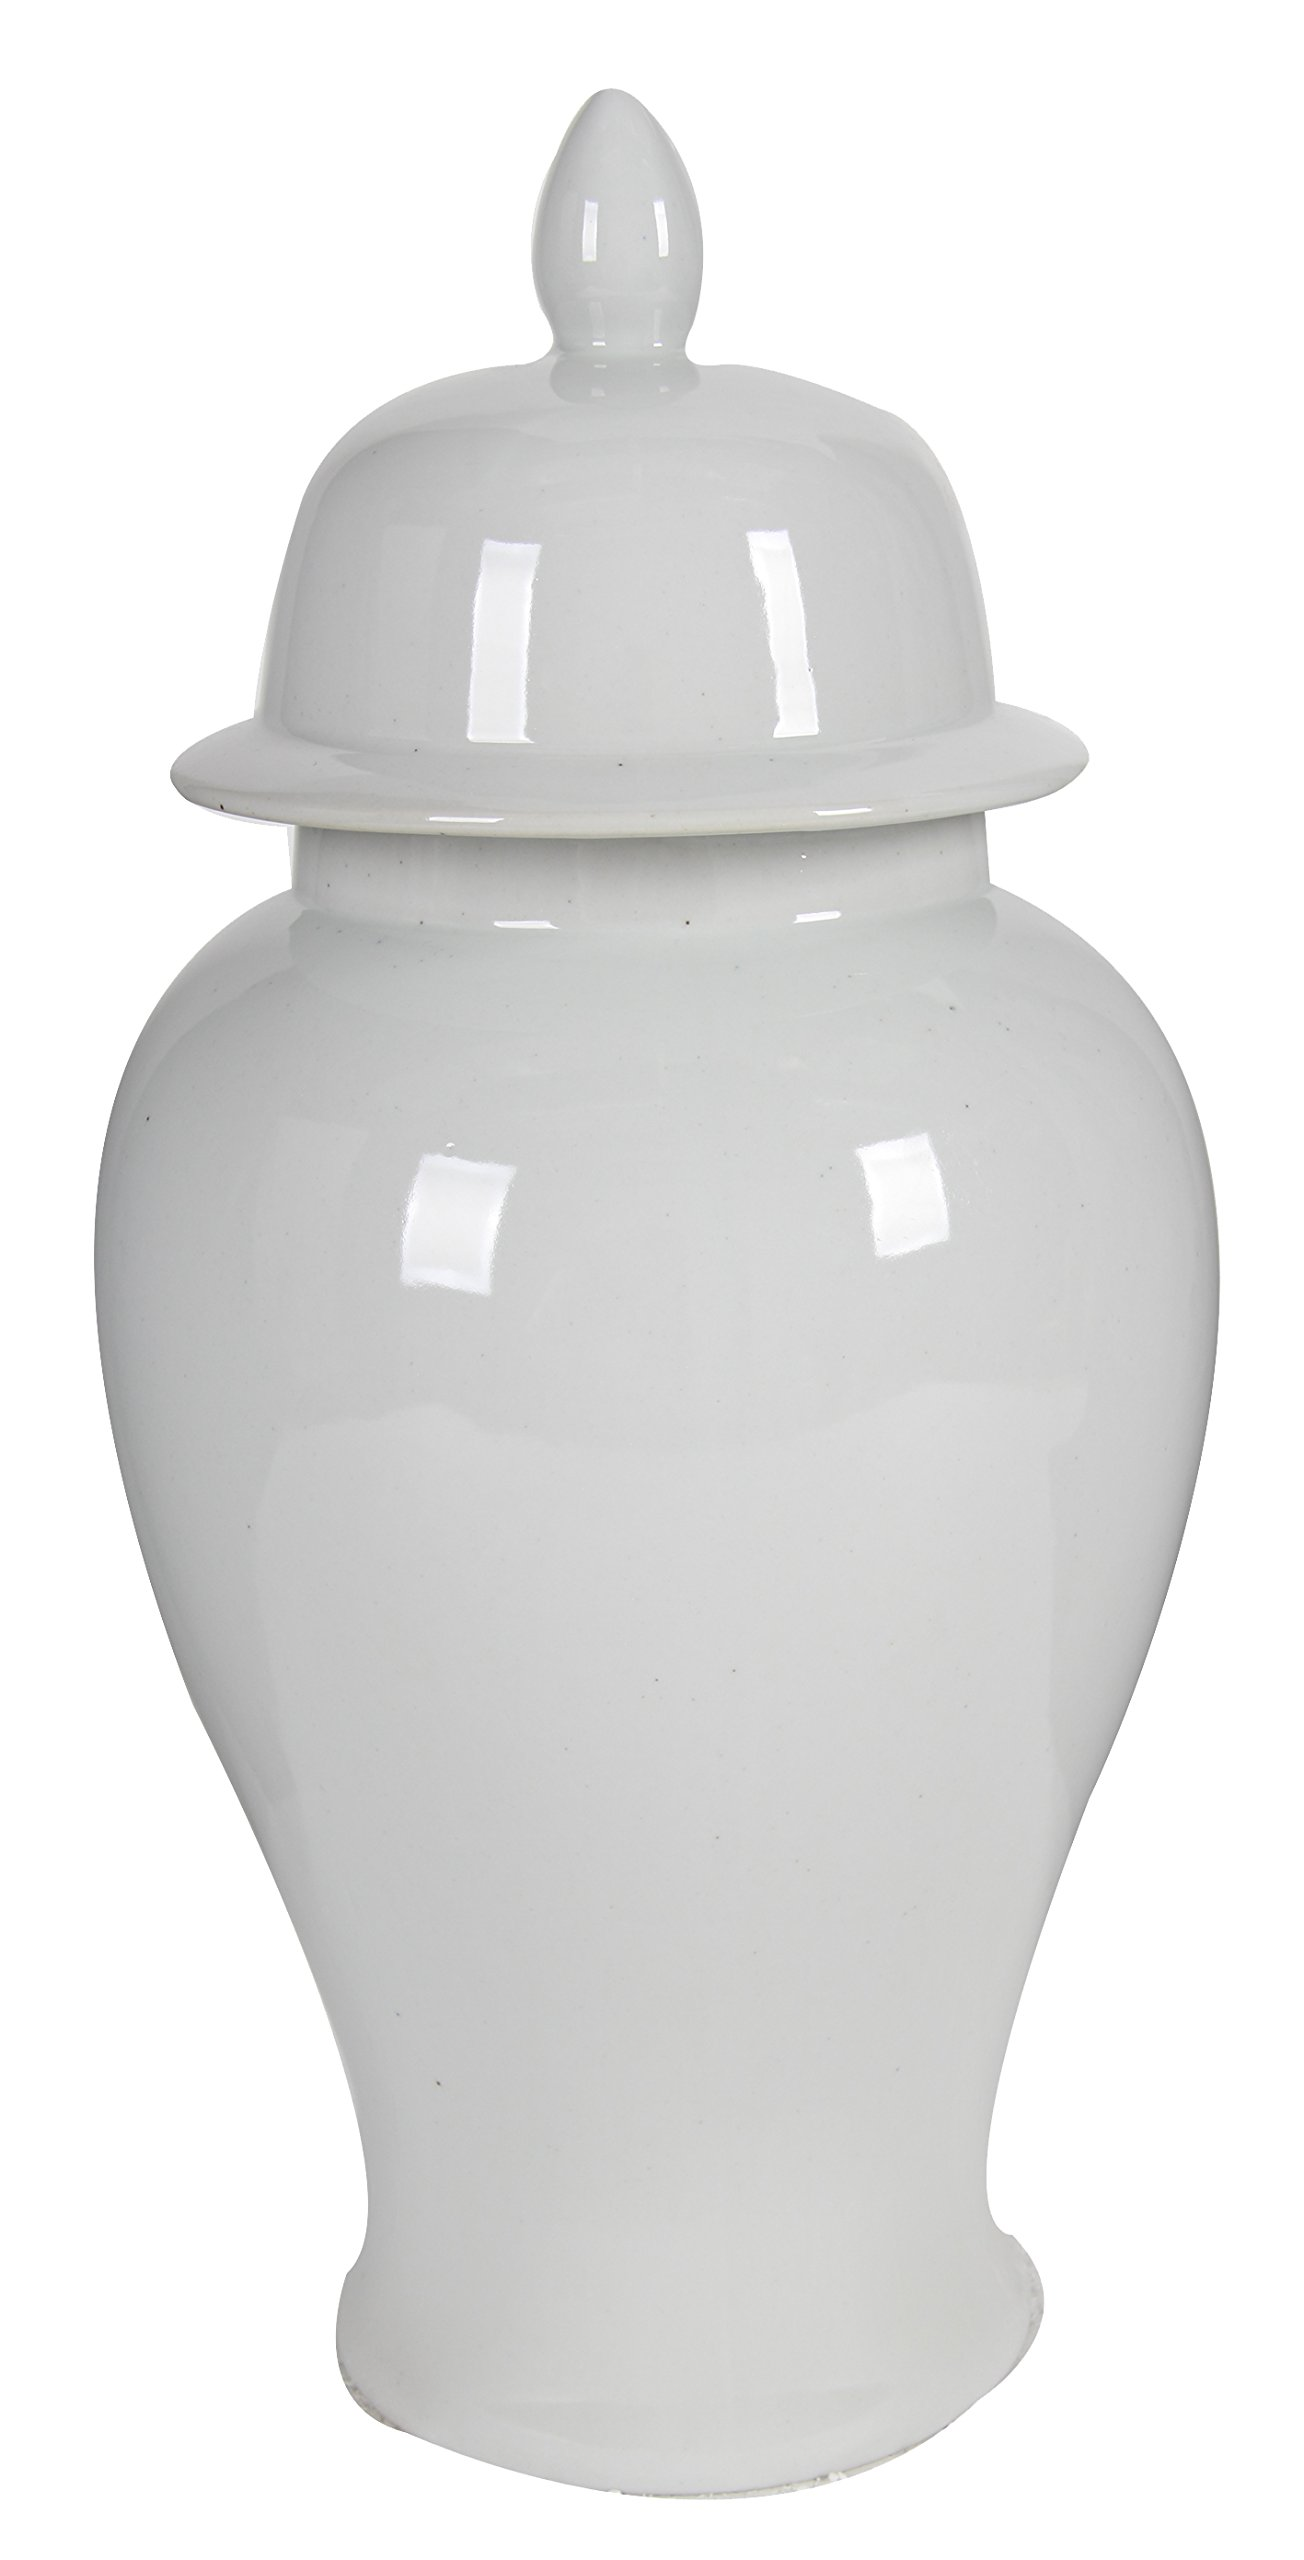 Benzara BM165657 Decorative Porcelain Ginger Jar with Lidded Top, Large, White